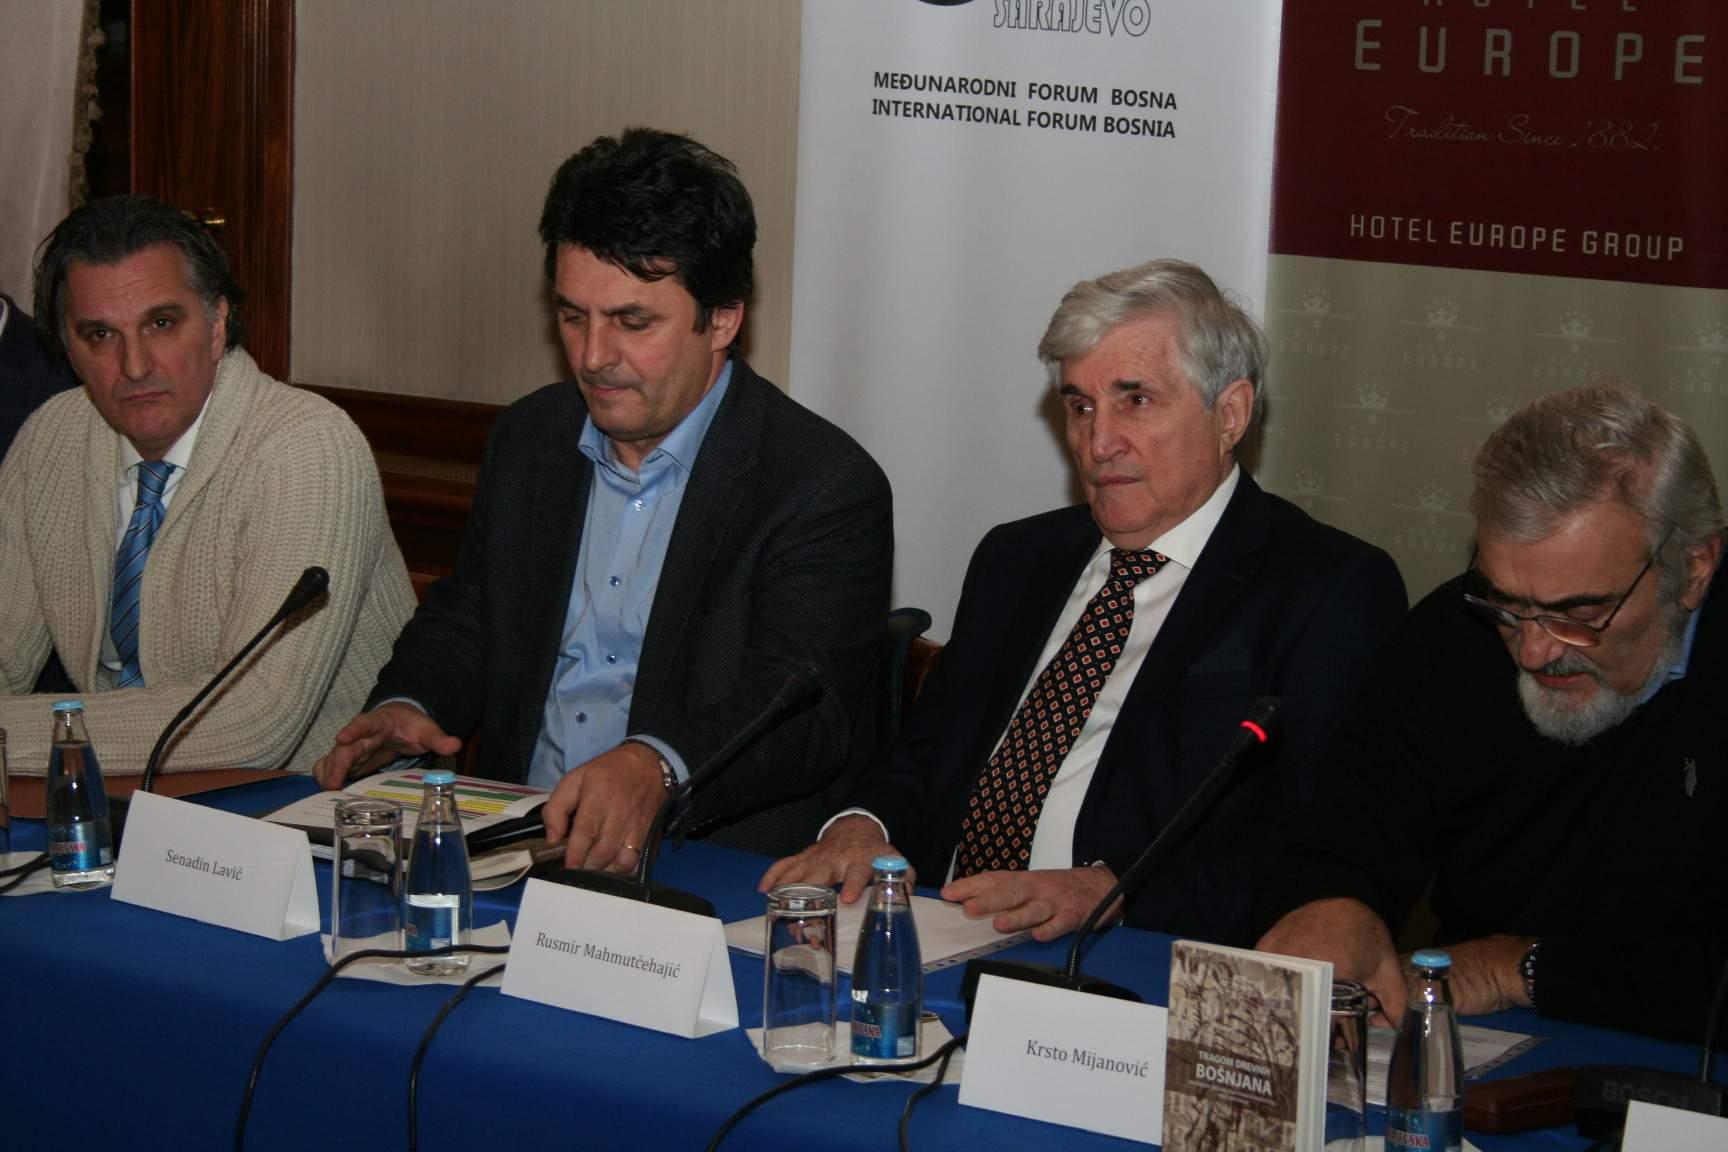 Picture 025.jpg - Đenan Galešić: Počeci osporavanja bosanske države i identiteta